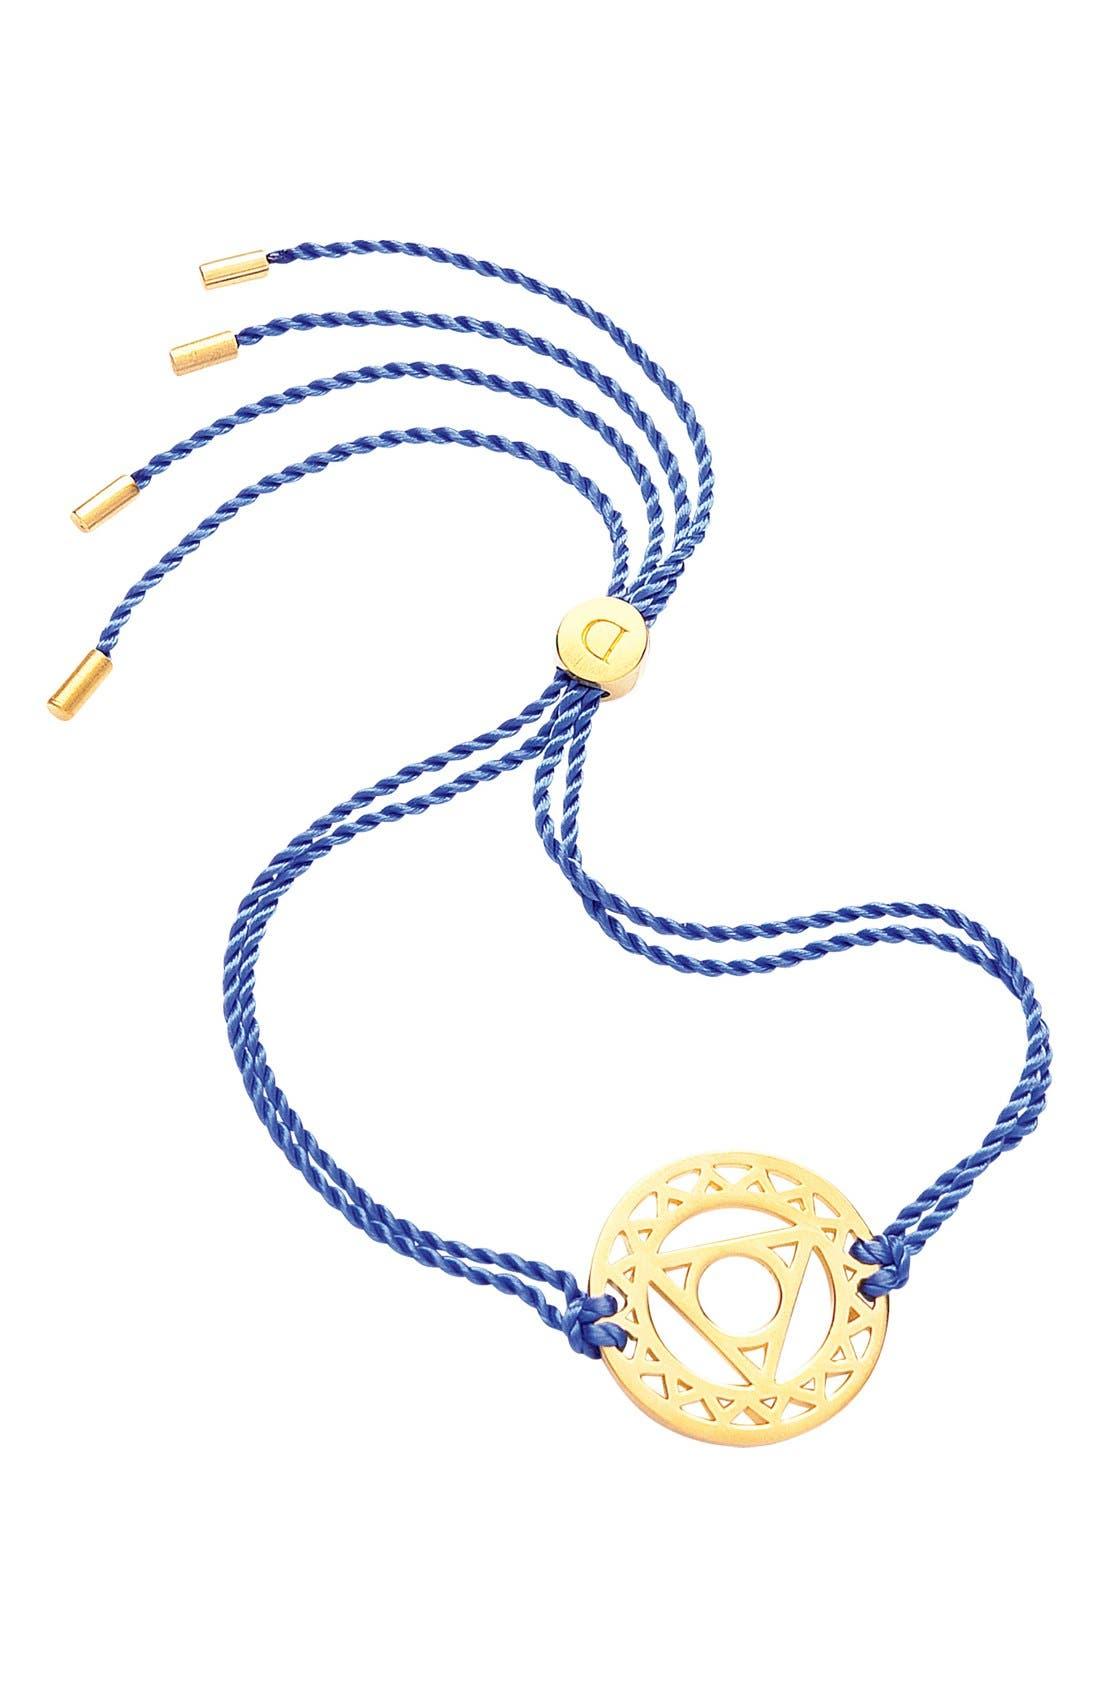 Alternate Image 1 Selected - Daisy London 'Throat Chakra' Cord Bracelet